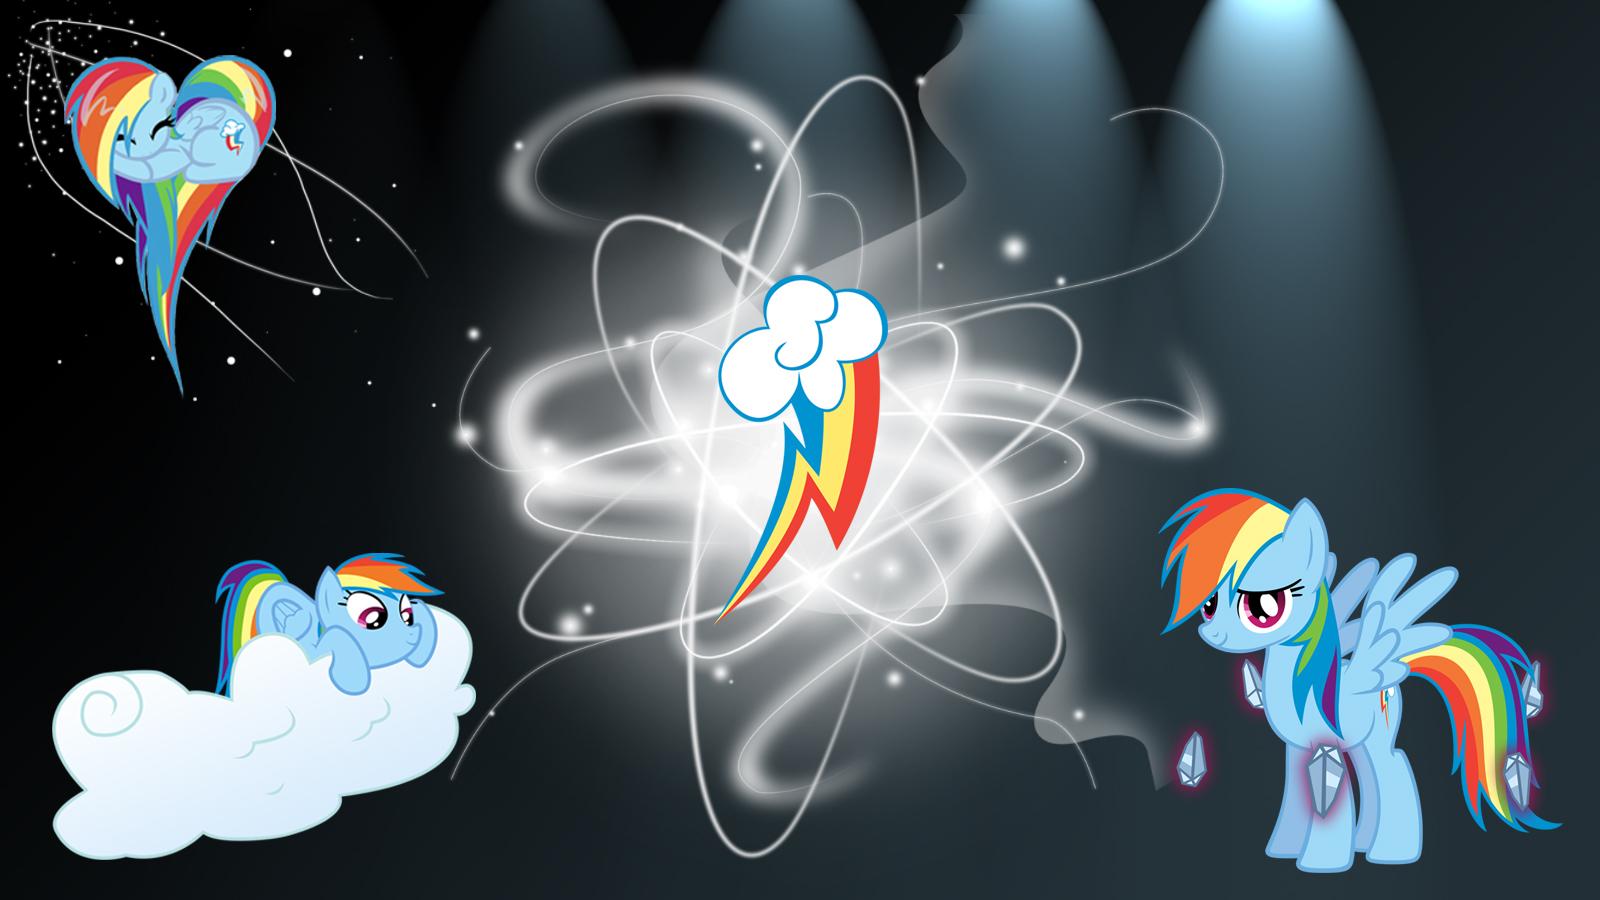 rainbow dash sphere background - photo #16